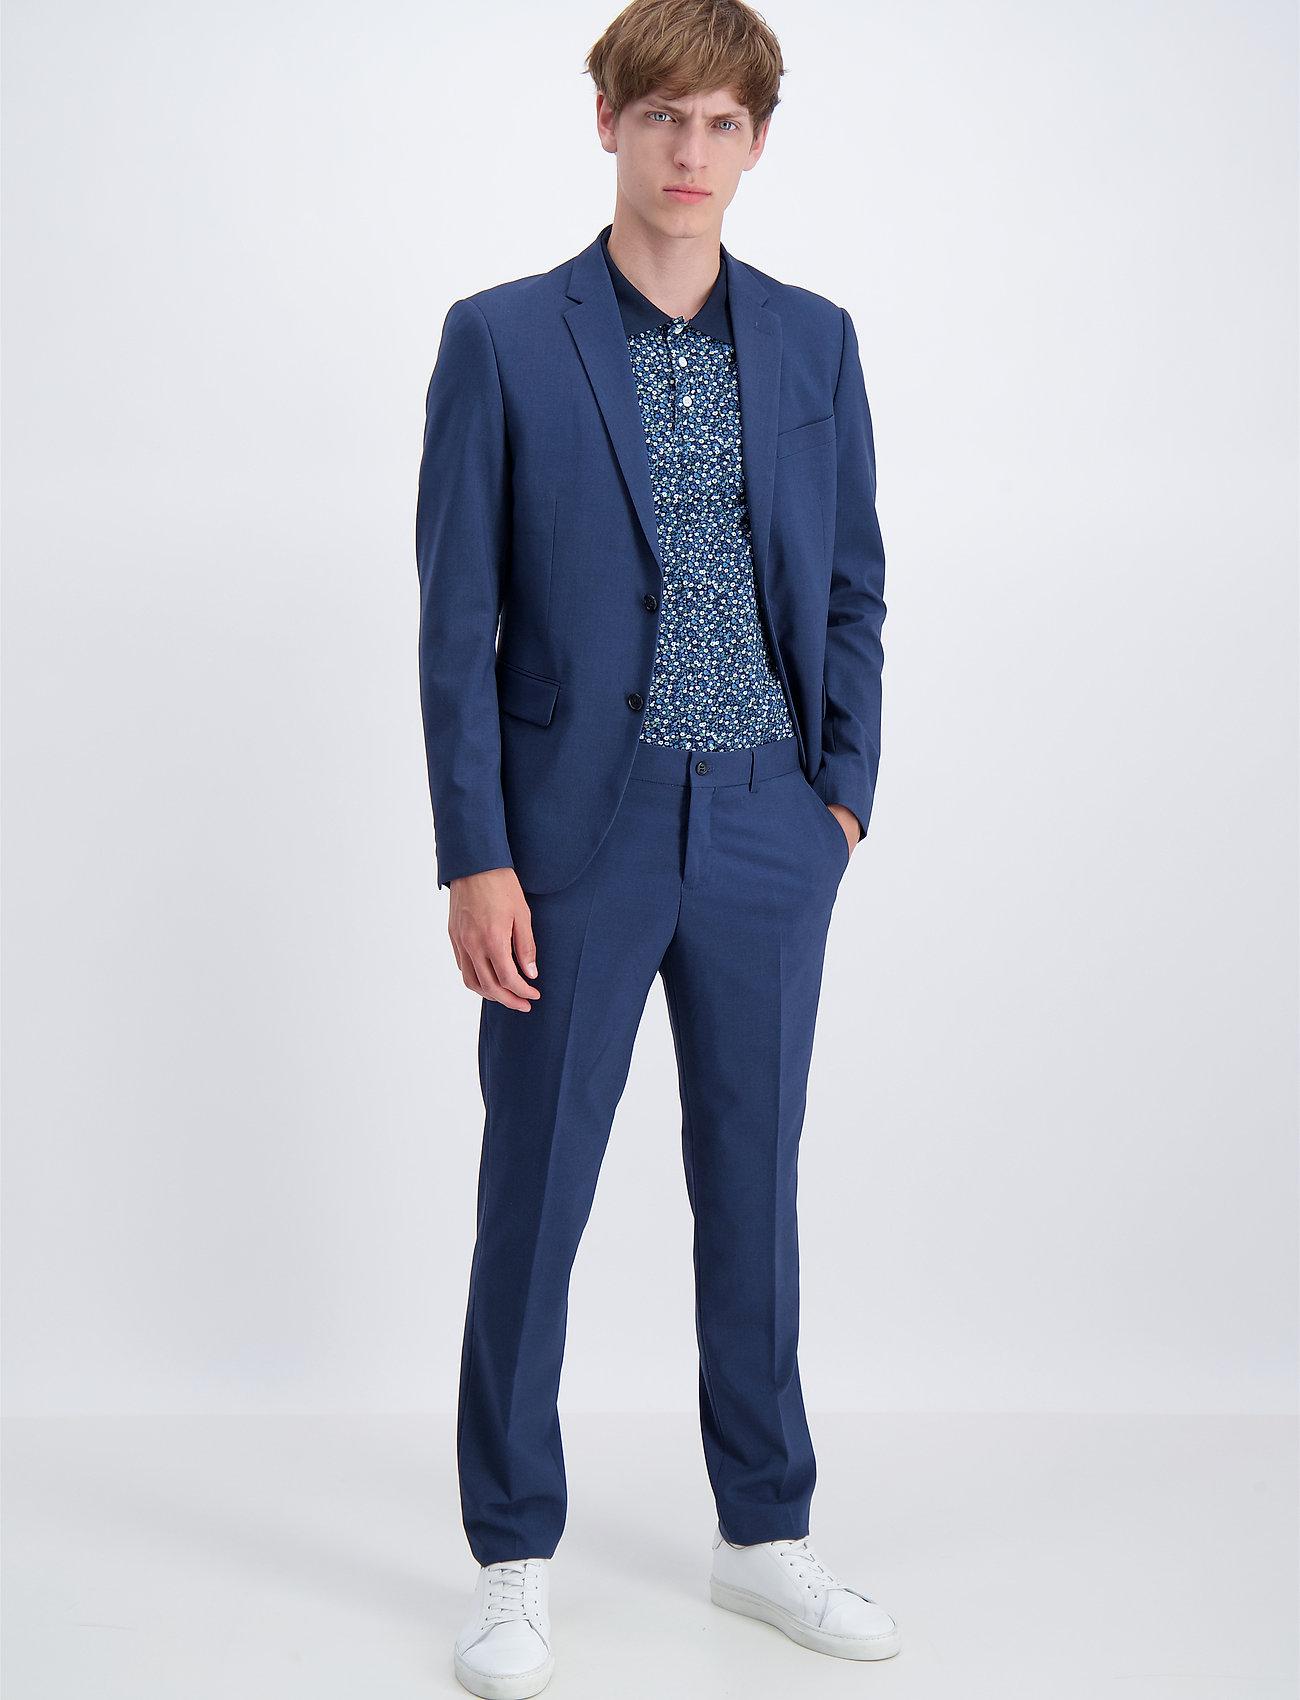 Lindbergh - Plain mens suit - yksiriviset puvut - blue mel - 0